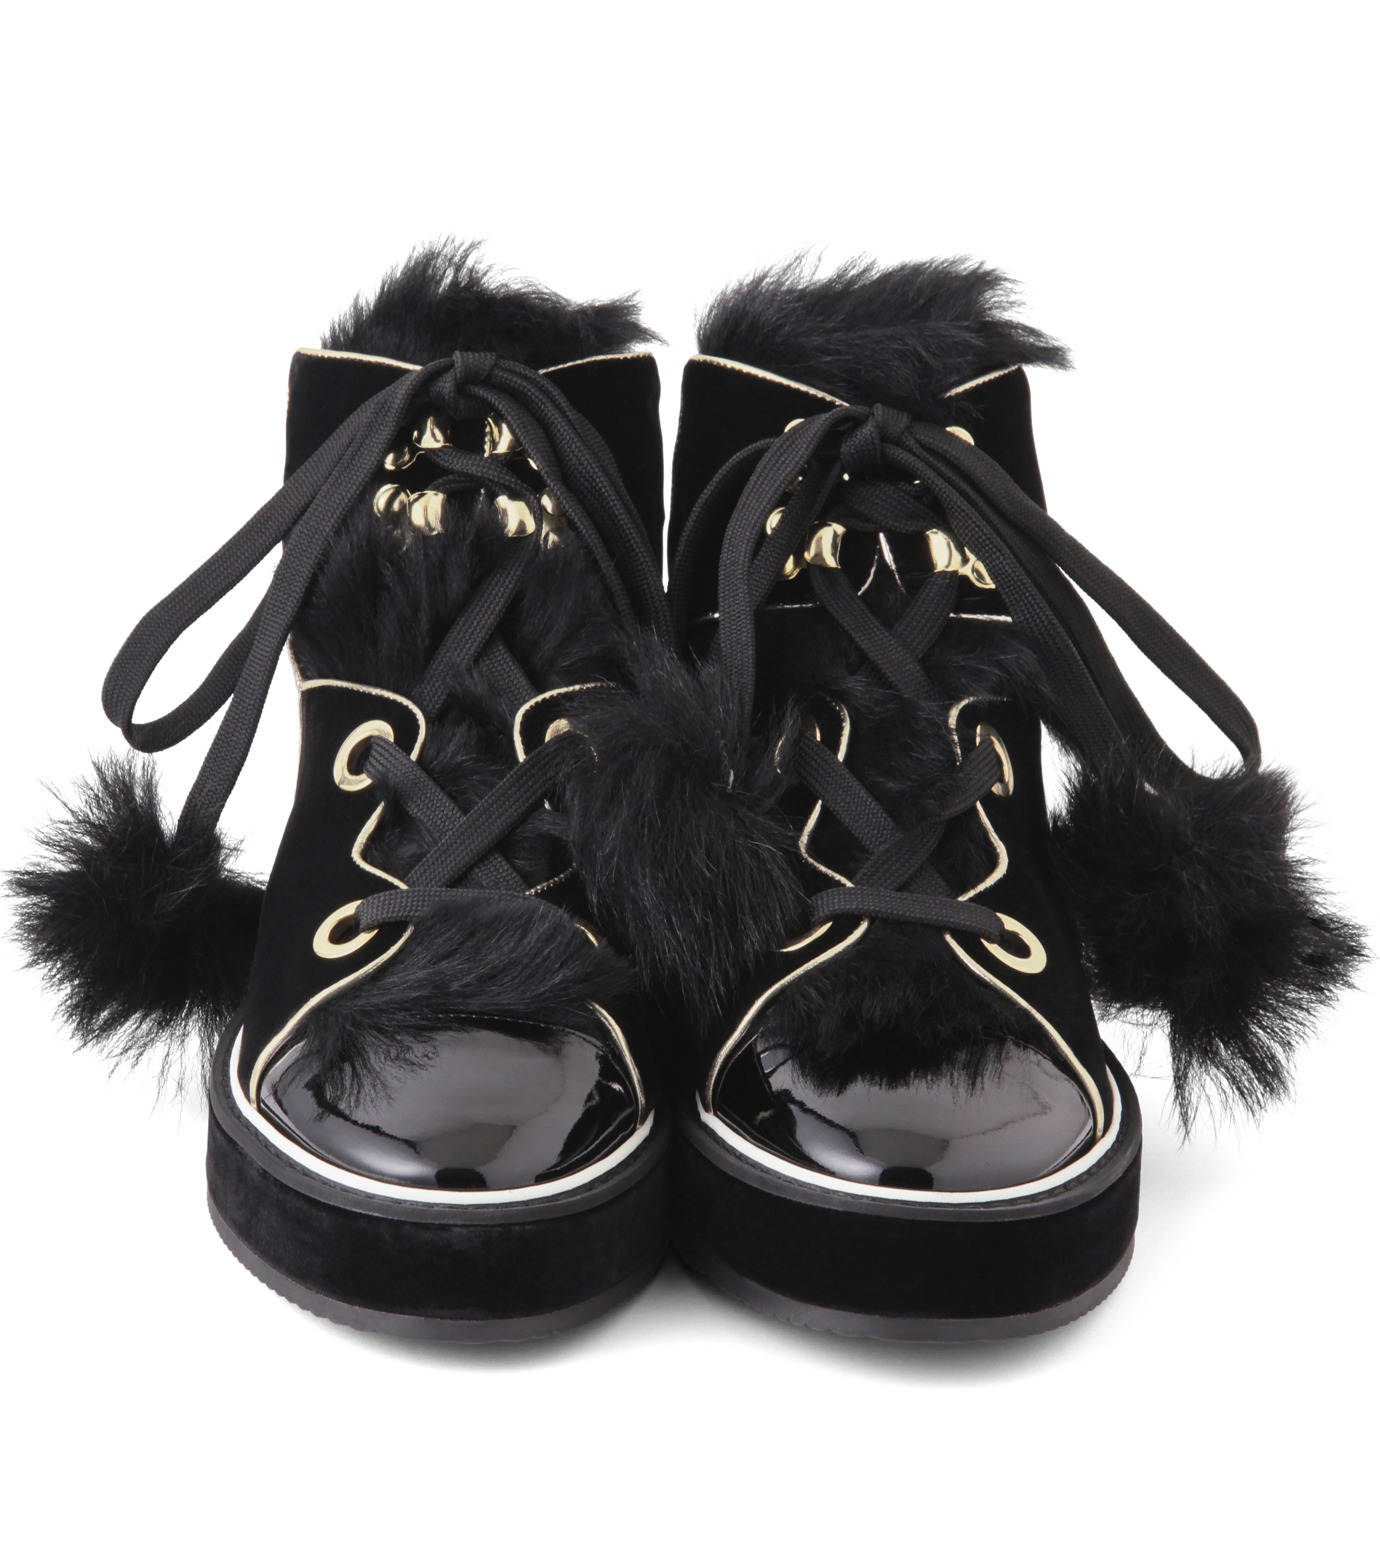 Nicholas  Kirkwood(ニコラス カークウッド)のPolly Neige High Top-BLACK(スニーカー/sneaker)-15AL161-13 拡大詳細画像4